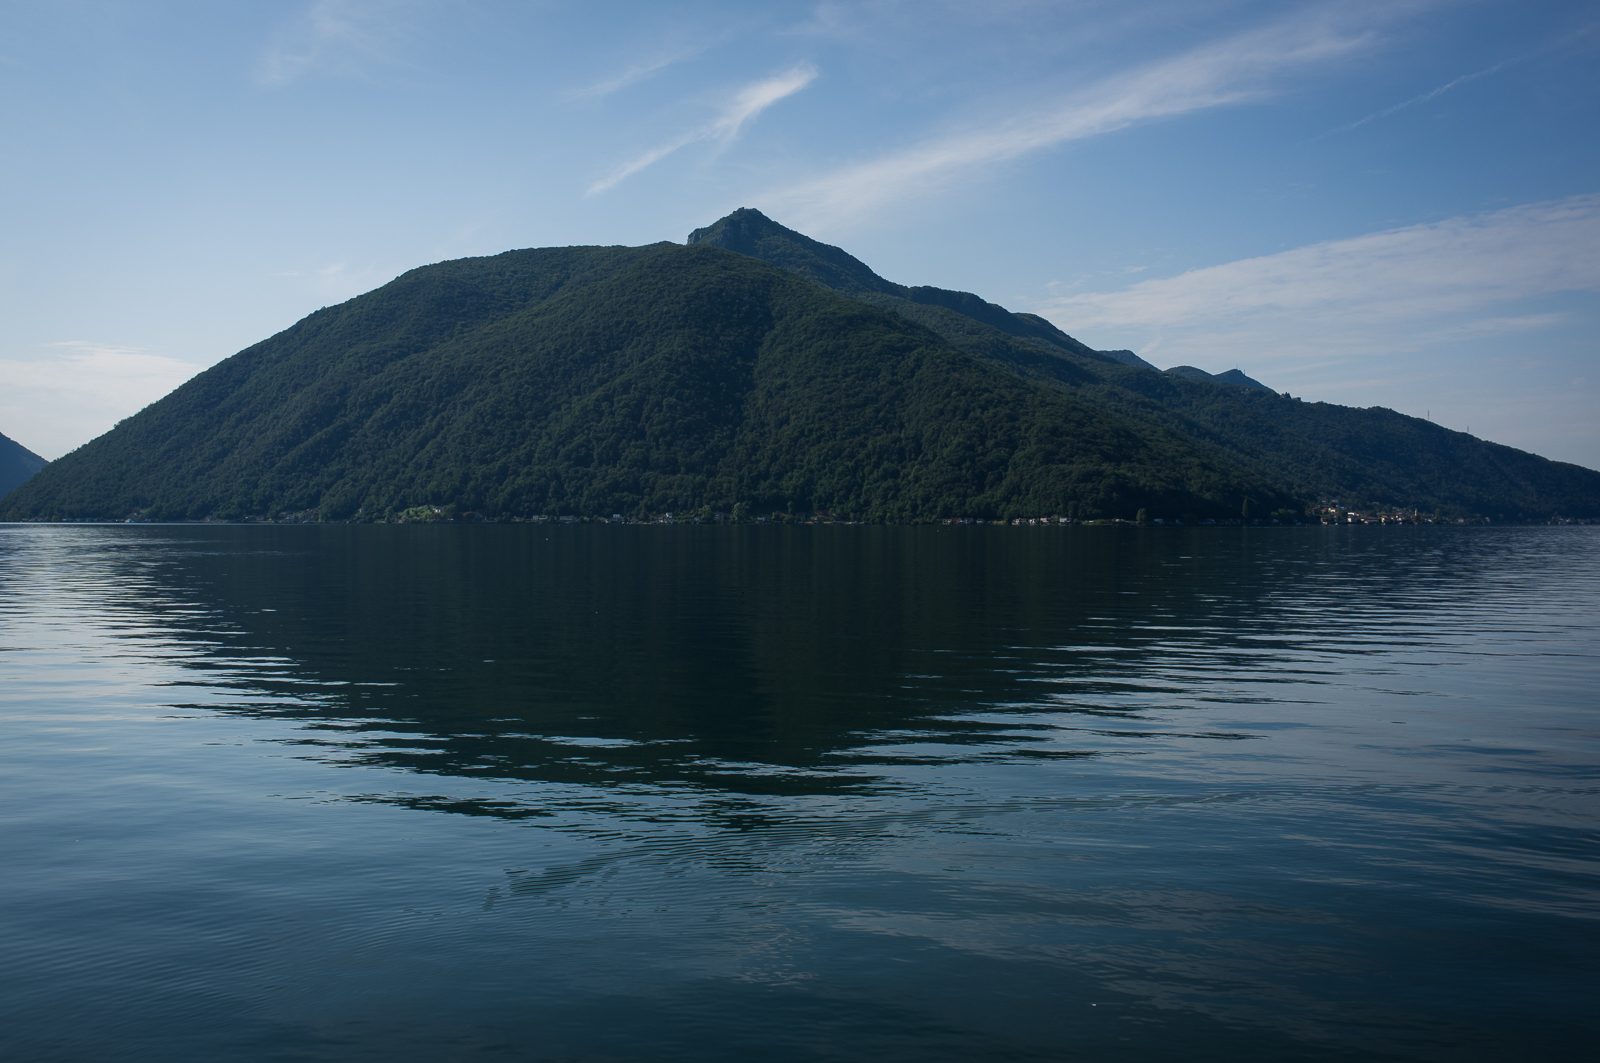 Monte San Giorgio - Lake Lugano